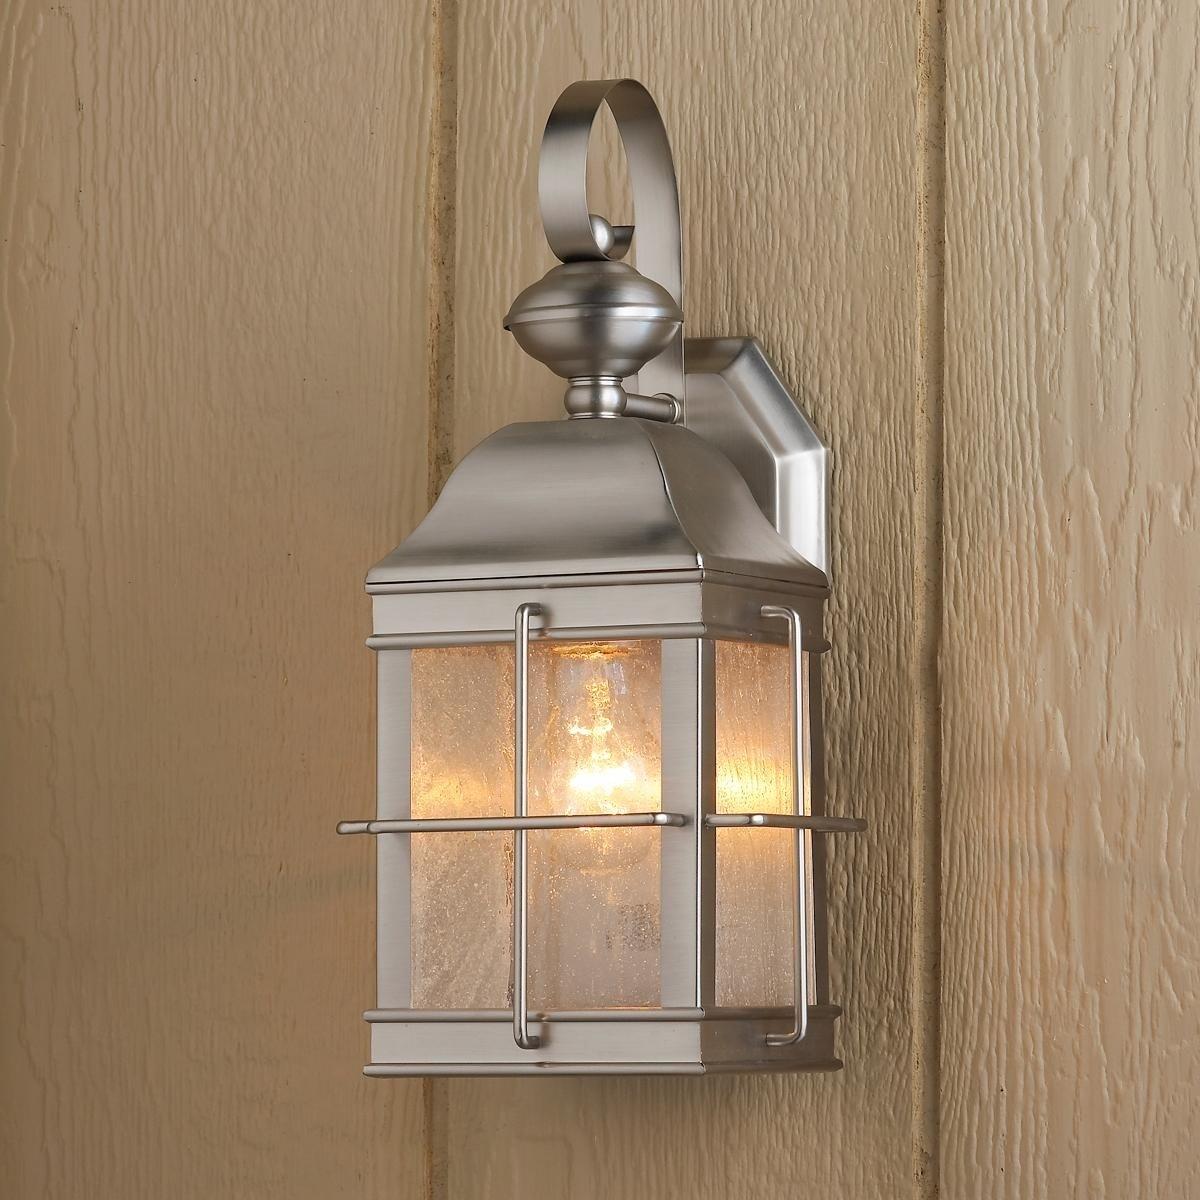 Nautical Inspired Lantern Outdoor Wall Light | Nautical Lanterns In Beach Outdoor Wall Lighting (#10 of 15)